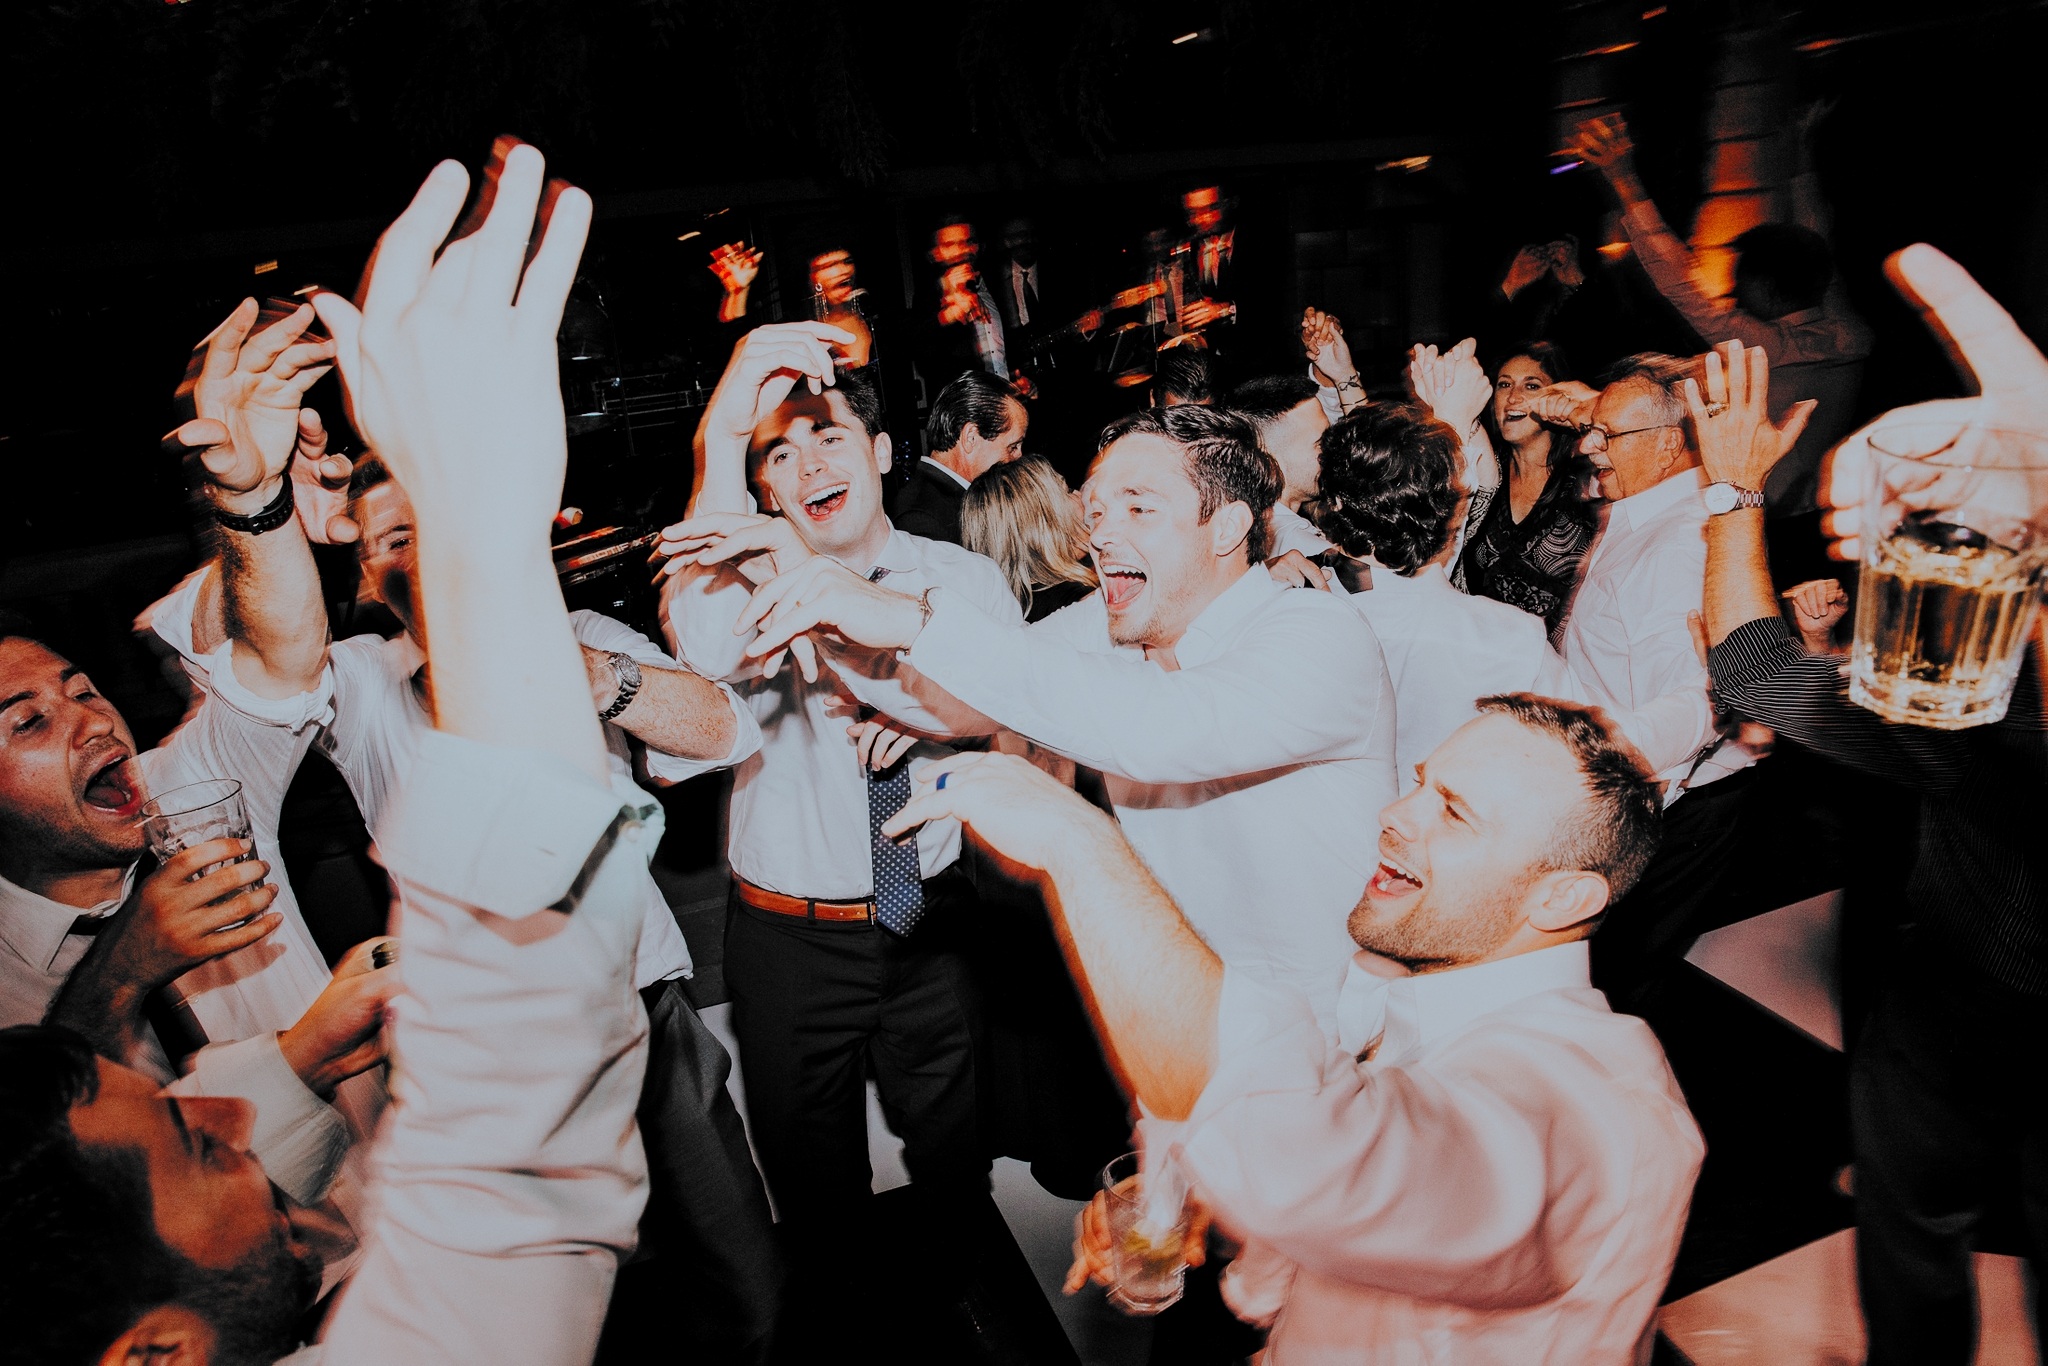 destination-austin-wedding-photographer-italy-florence592.JPG